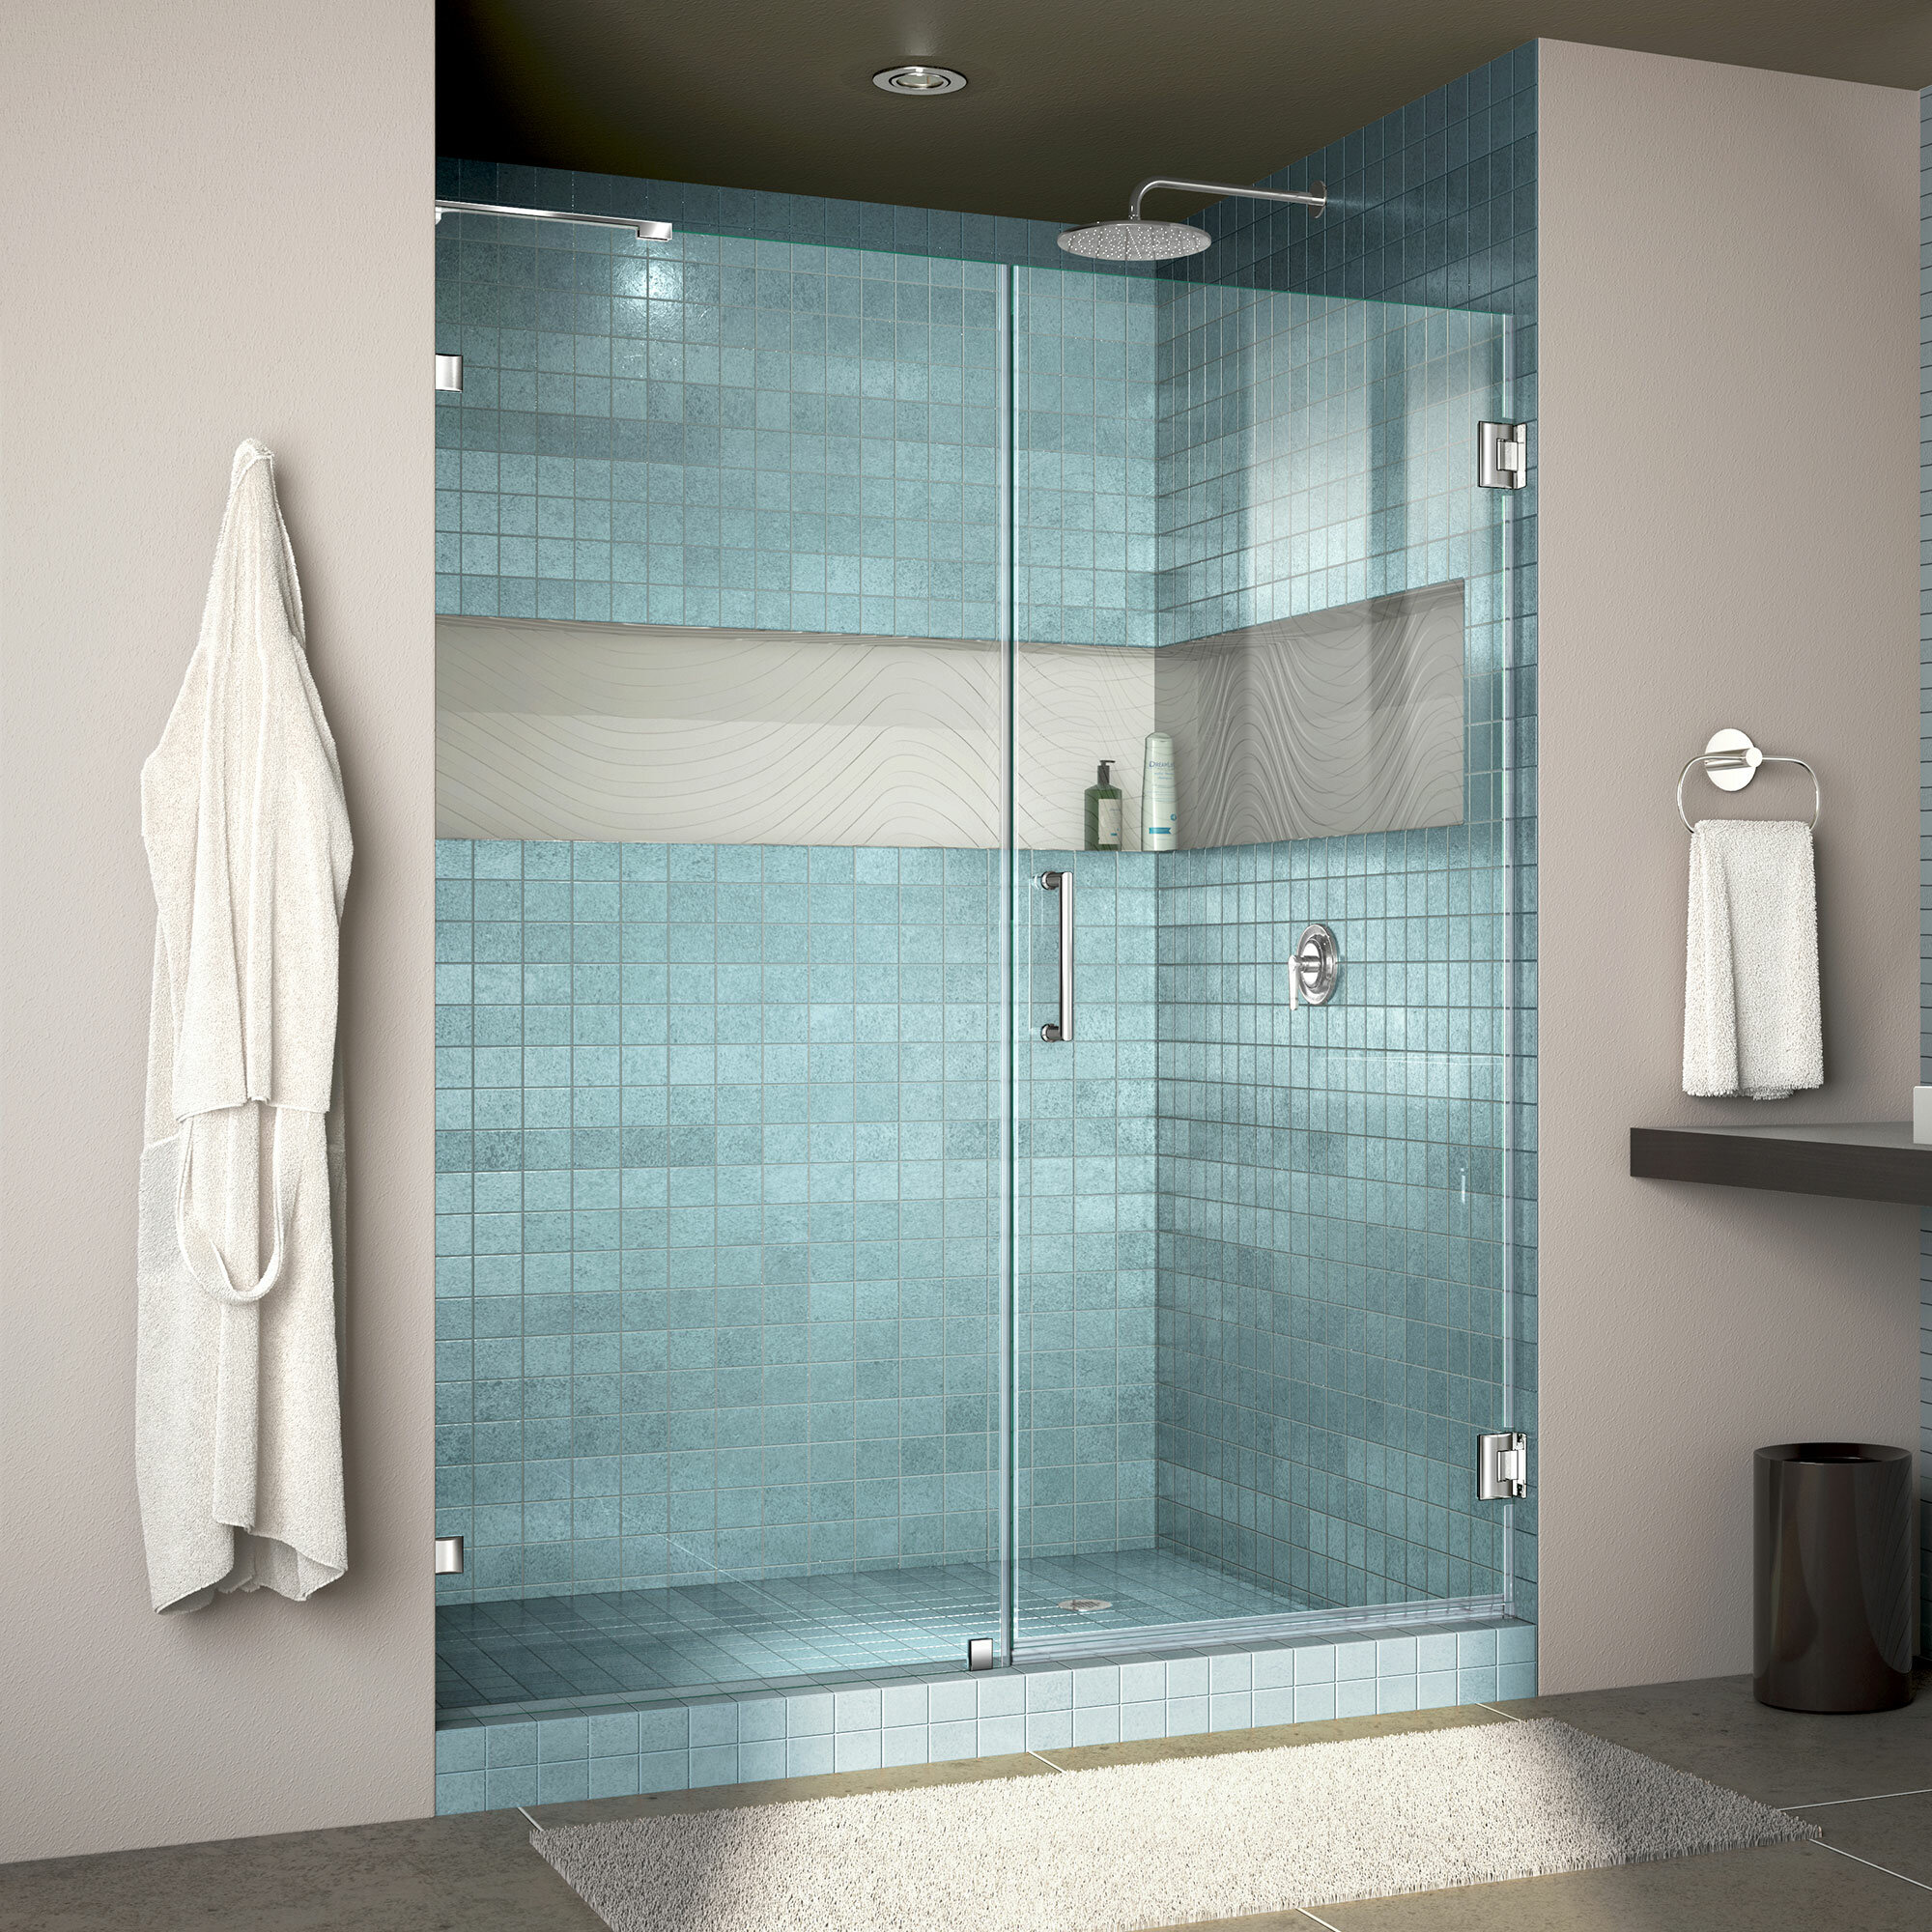 Dreamline Unidoor Lux 54 W X 72 H Hinged Frameless Shower Door With Clearmax Technology Wayfair